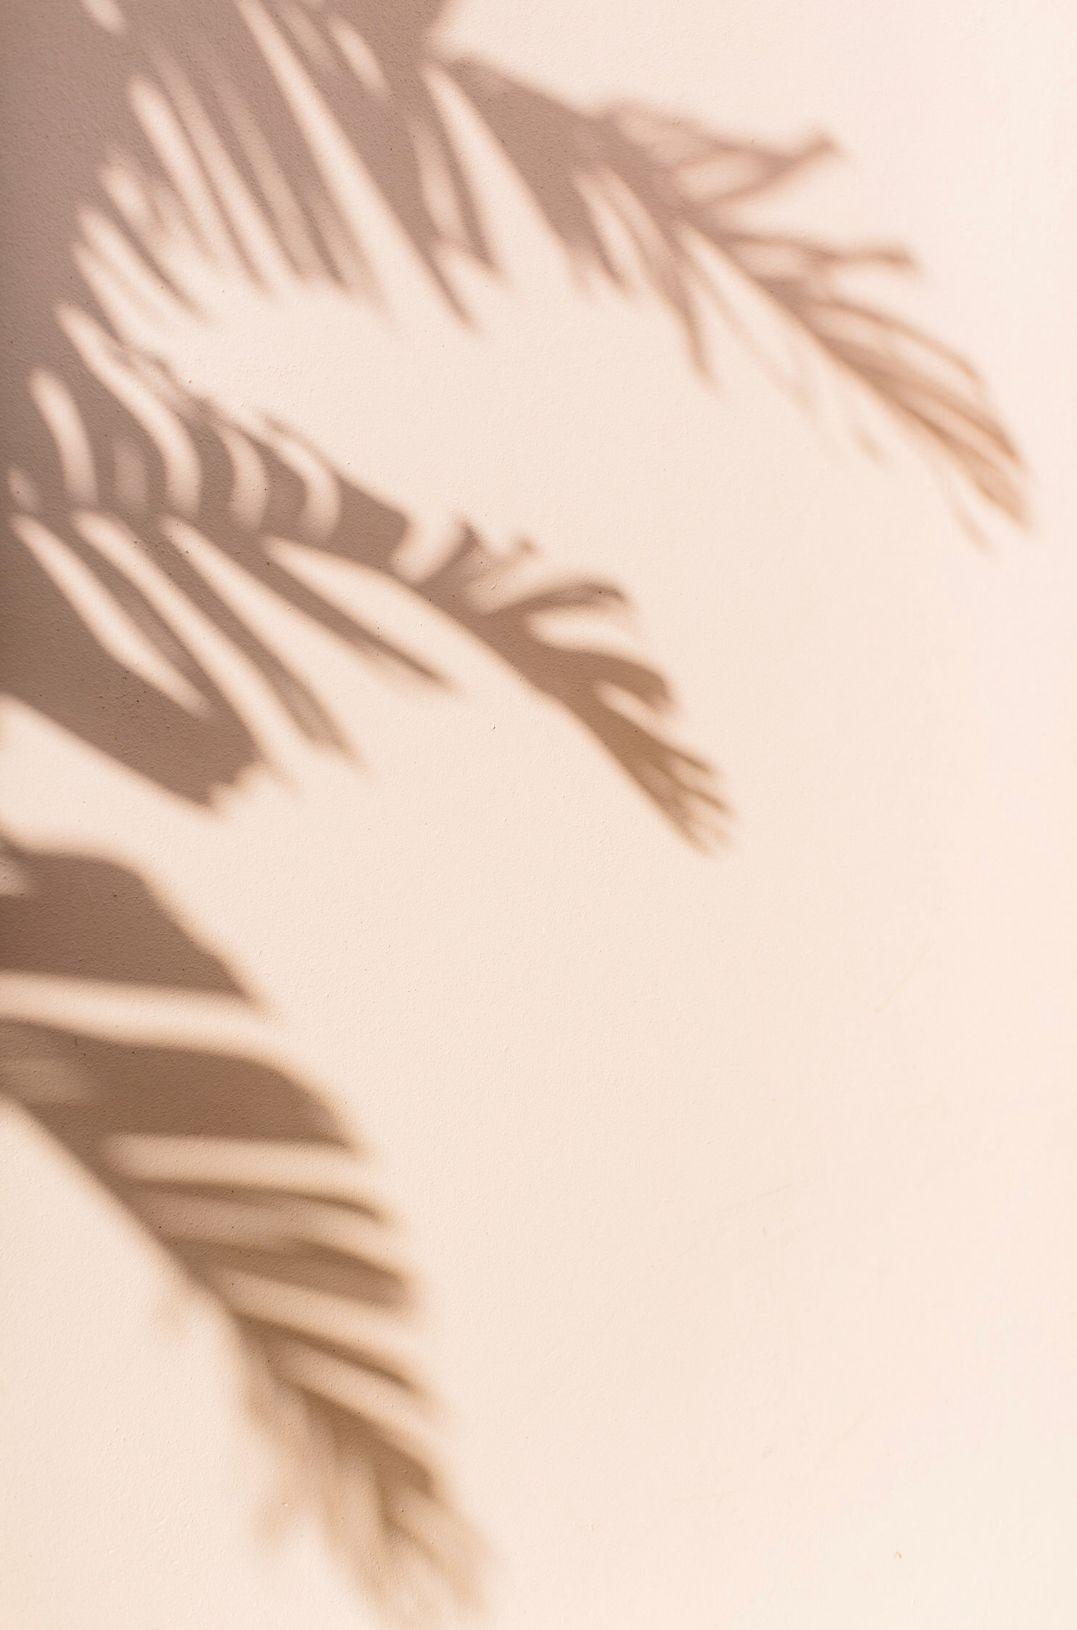 Pin By Rachel Kuch On Florida Beige Aesthetic Aesthetic Iphone Wallpaper Beige Wallpaper